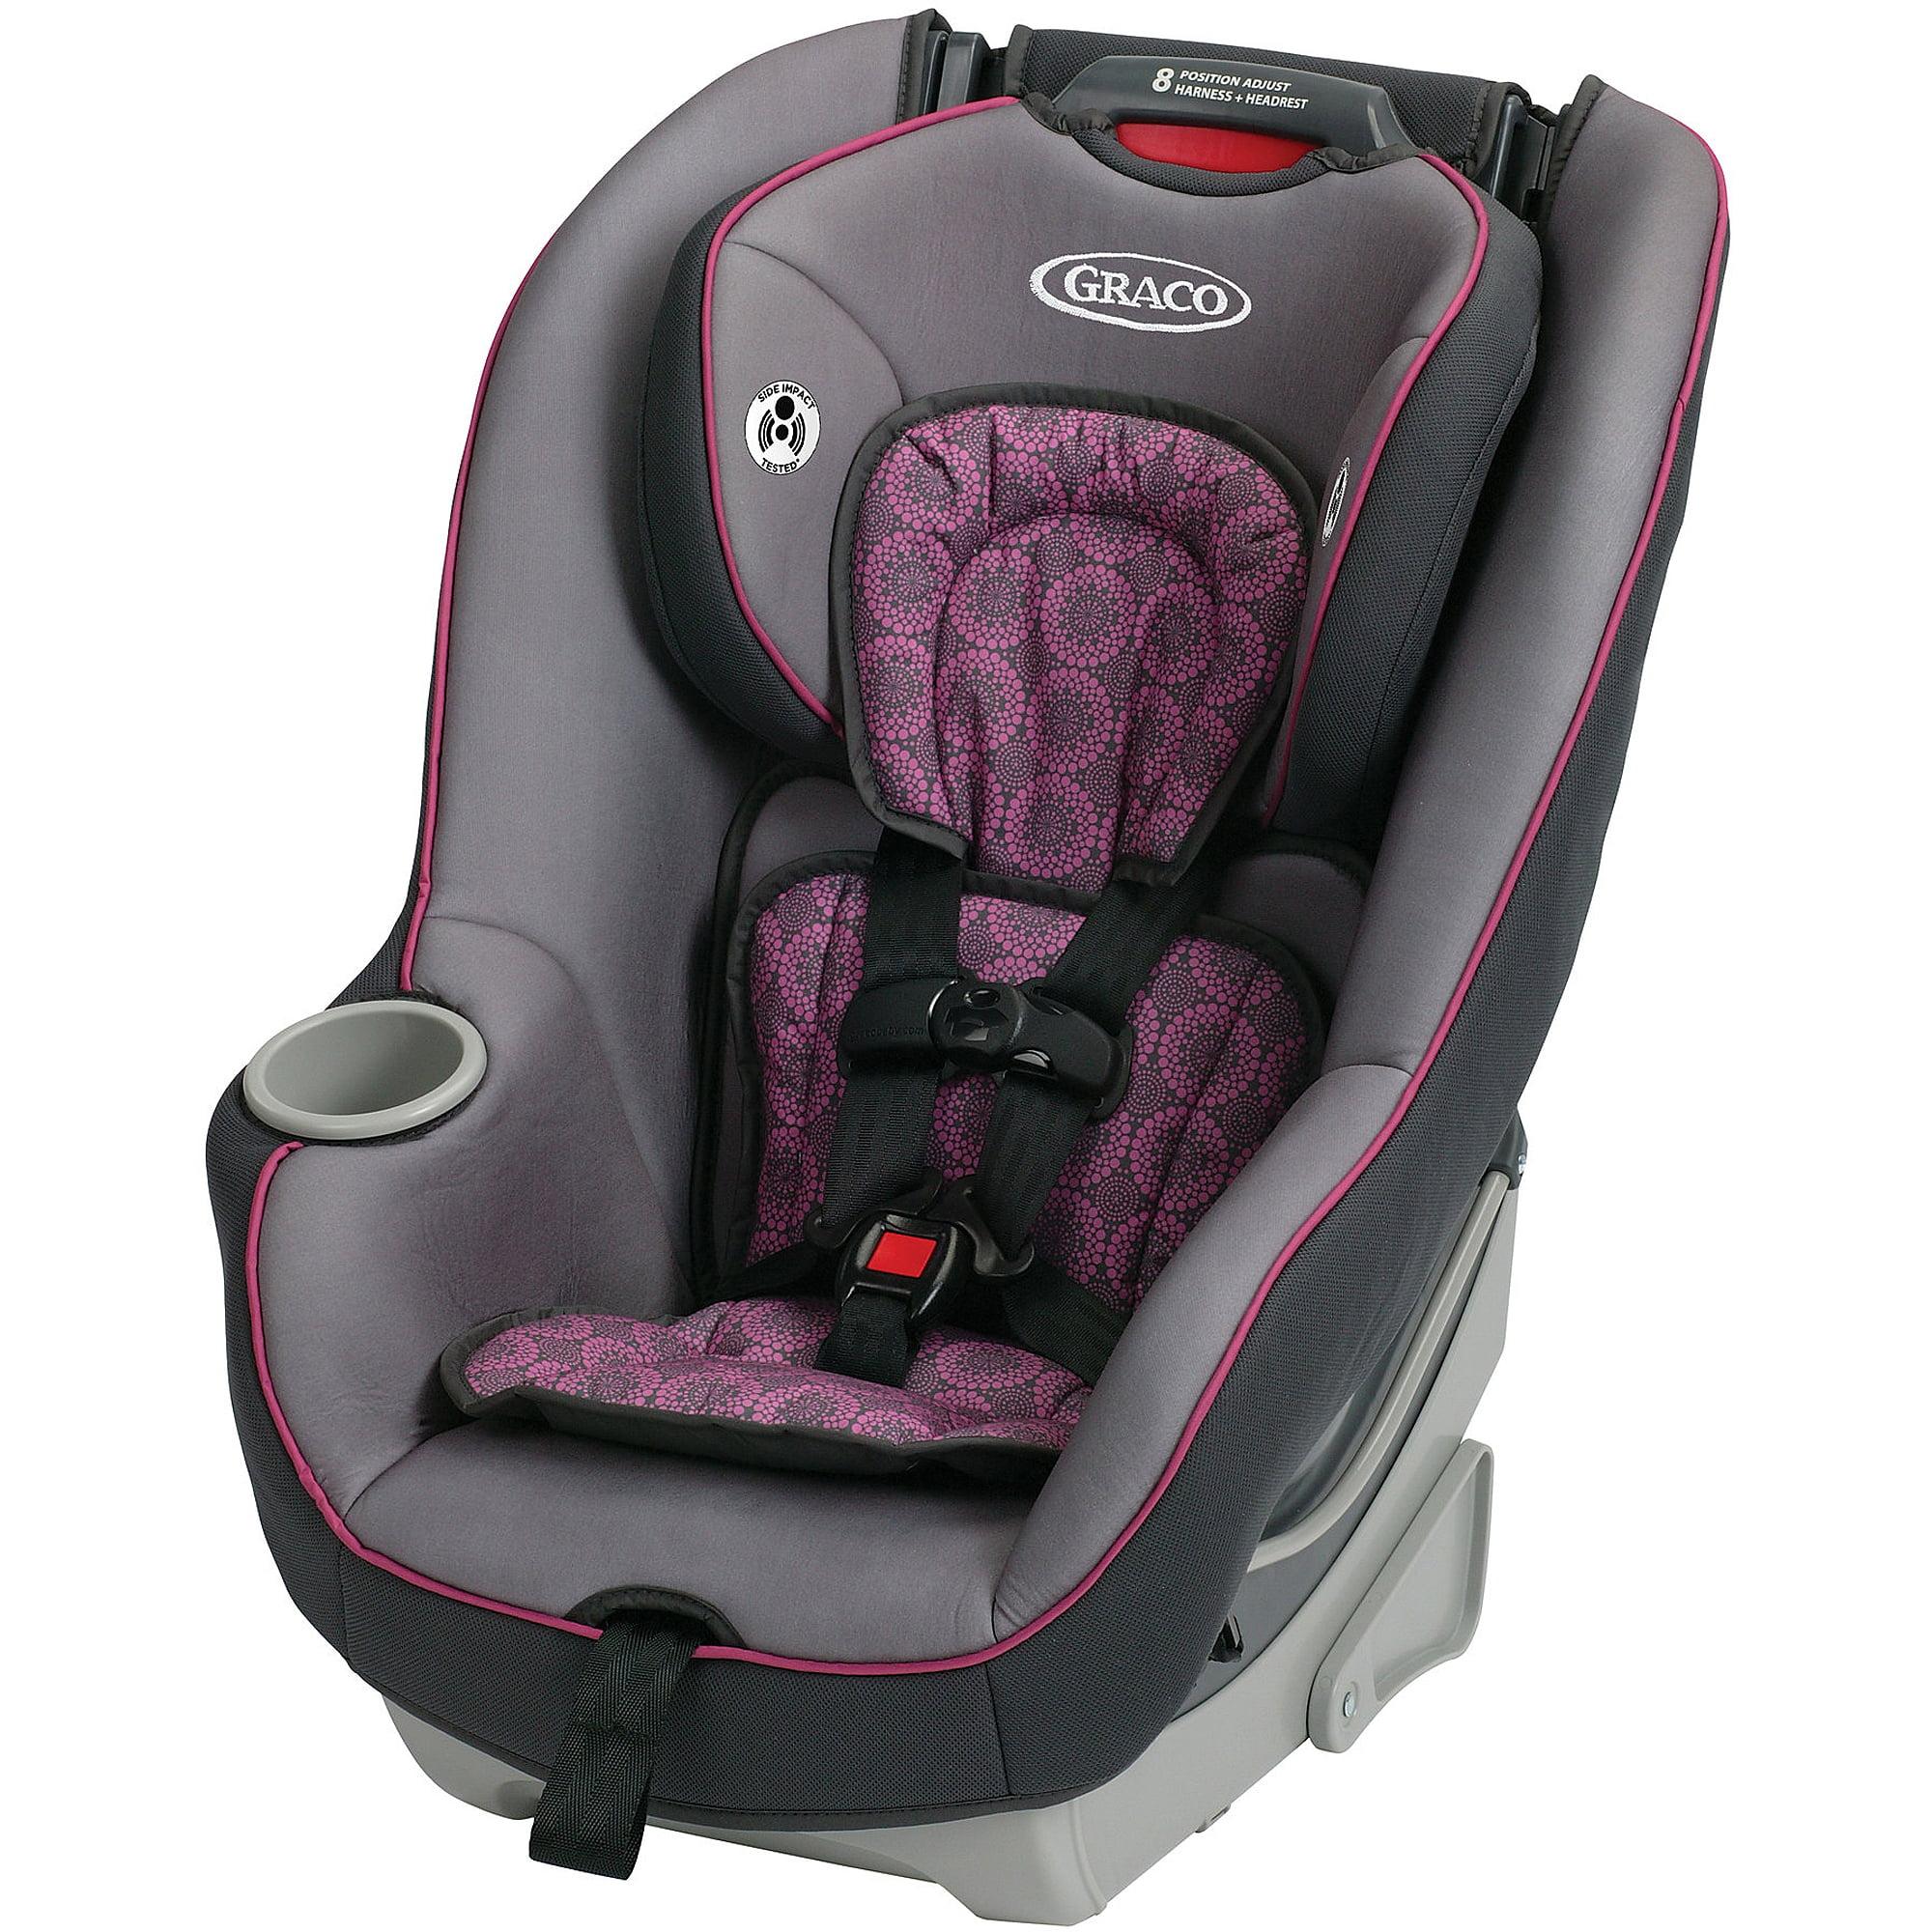 Graco Contender 65 Convertible Car Seat, Arabella